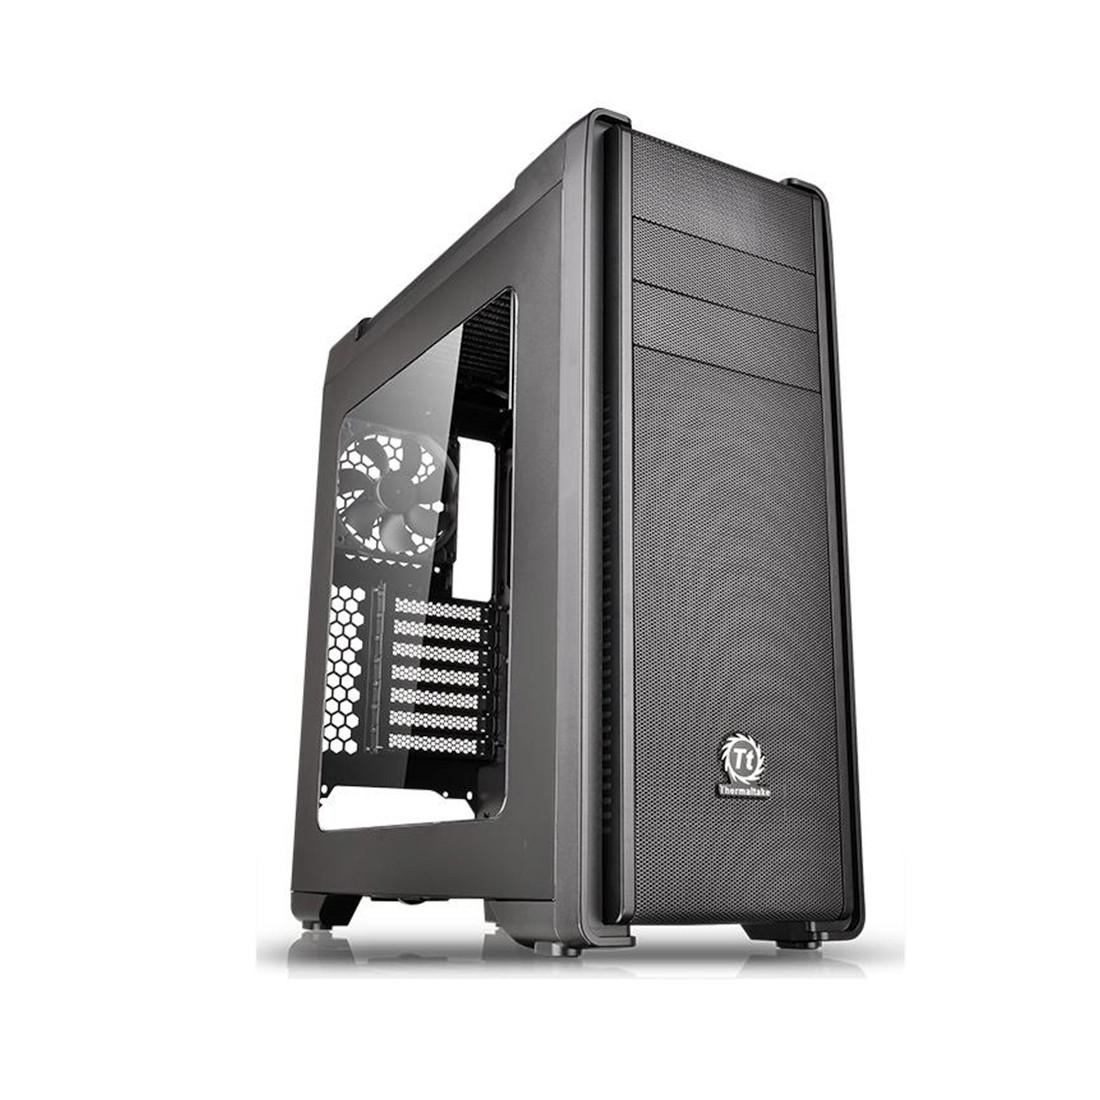 Компьютерный корпус Thermaltake Versa C21 RGB Black